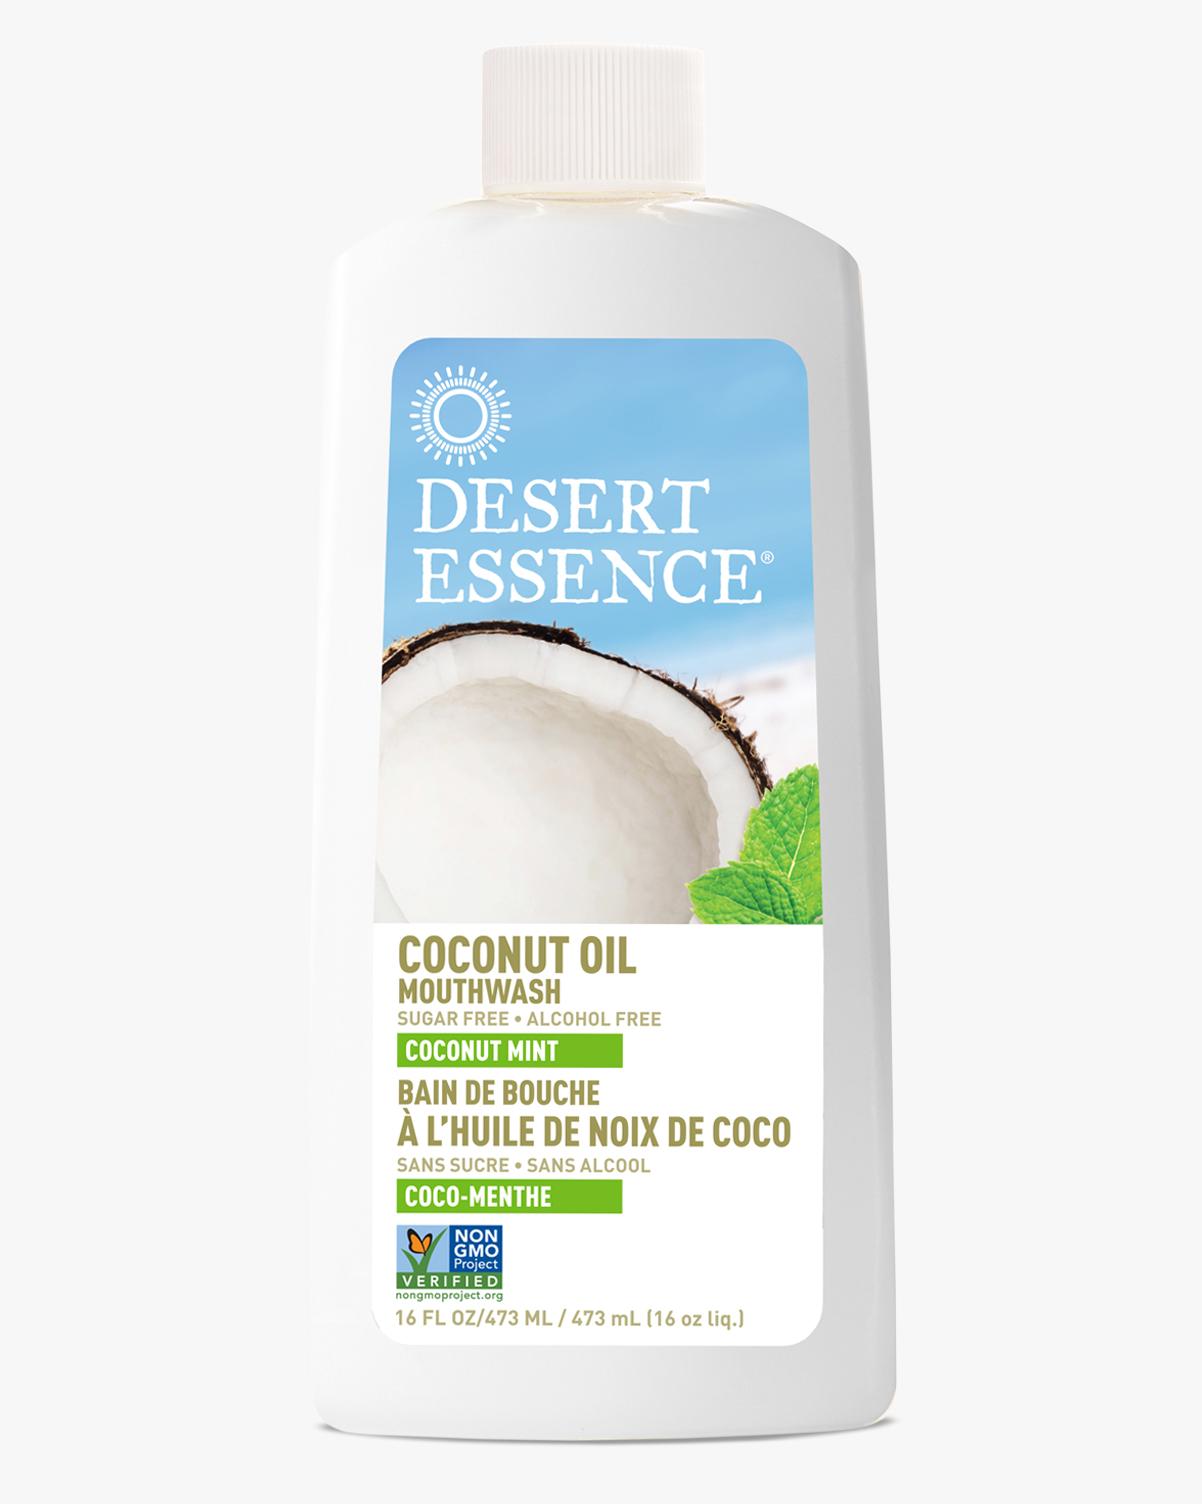 Desert Essence coupon: Desert Essence Coconut Oil Mouthwash, 16 fl. oz. | Vegan | Gluten-Free